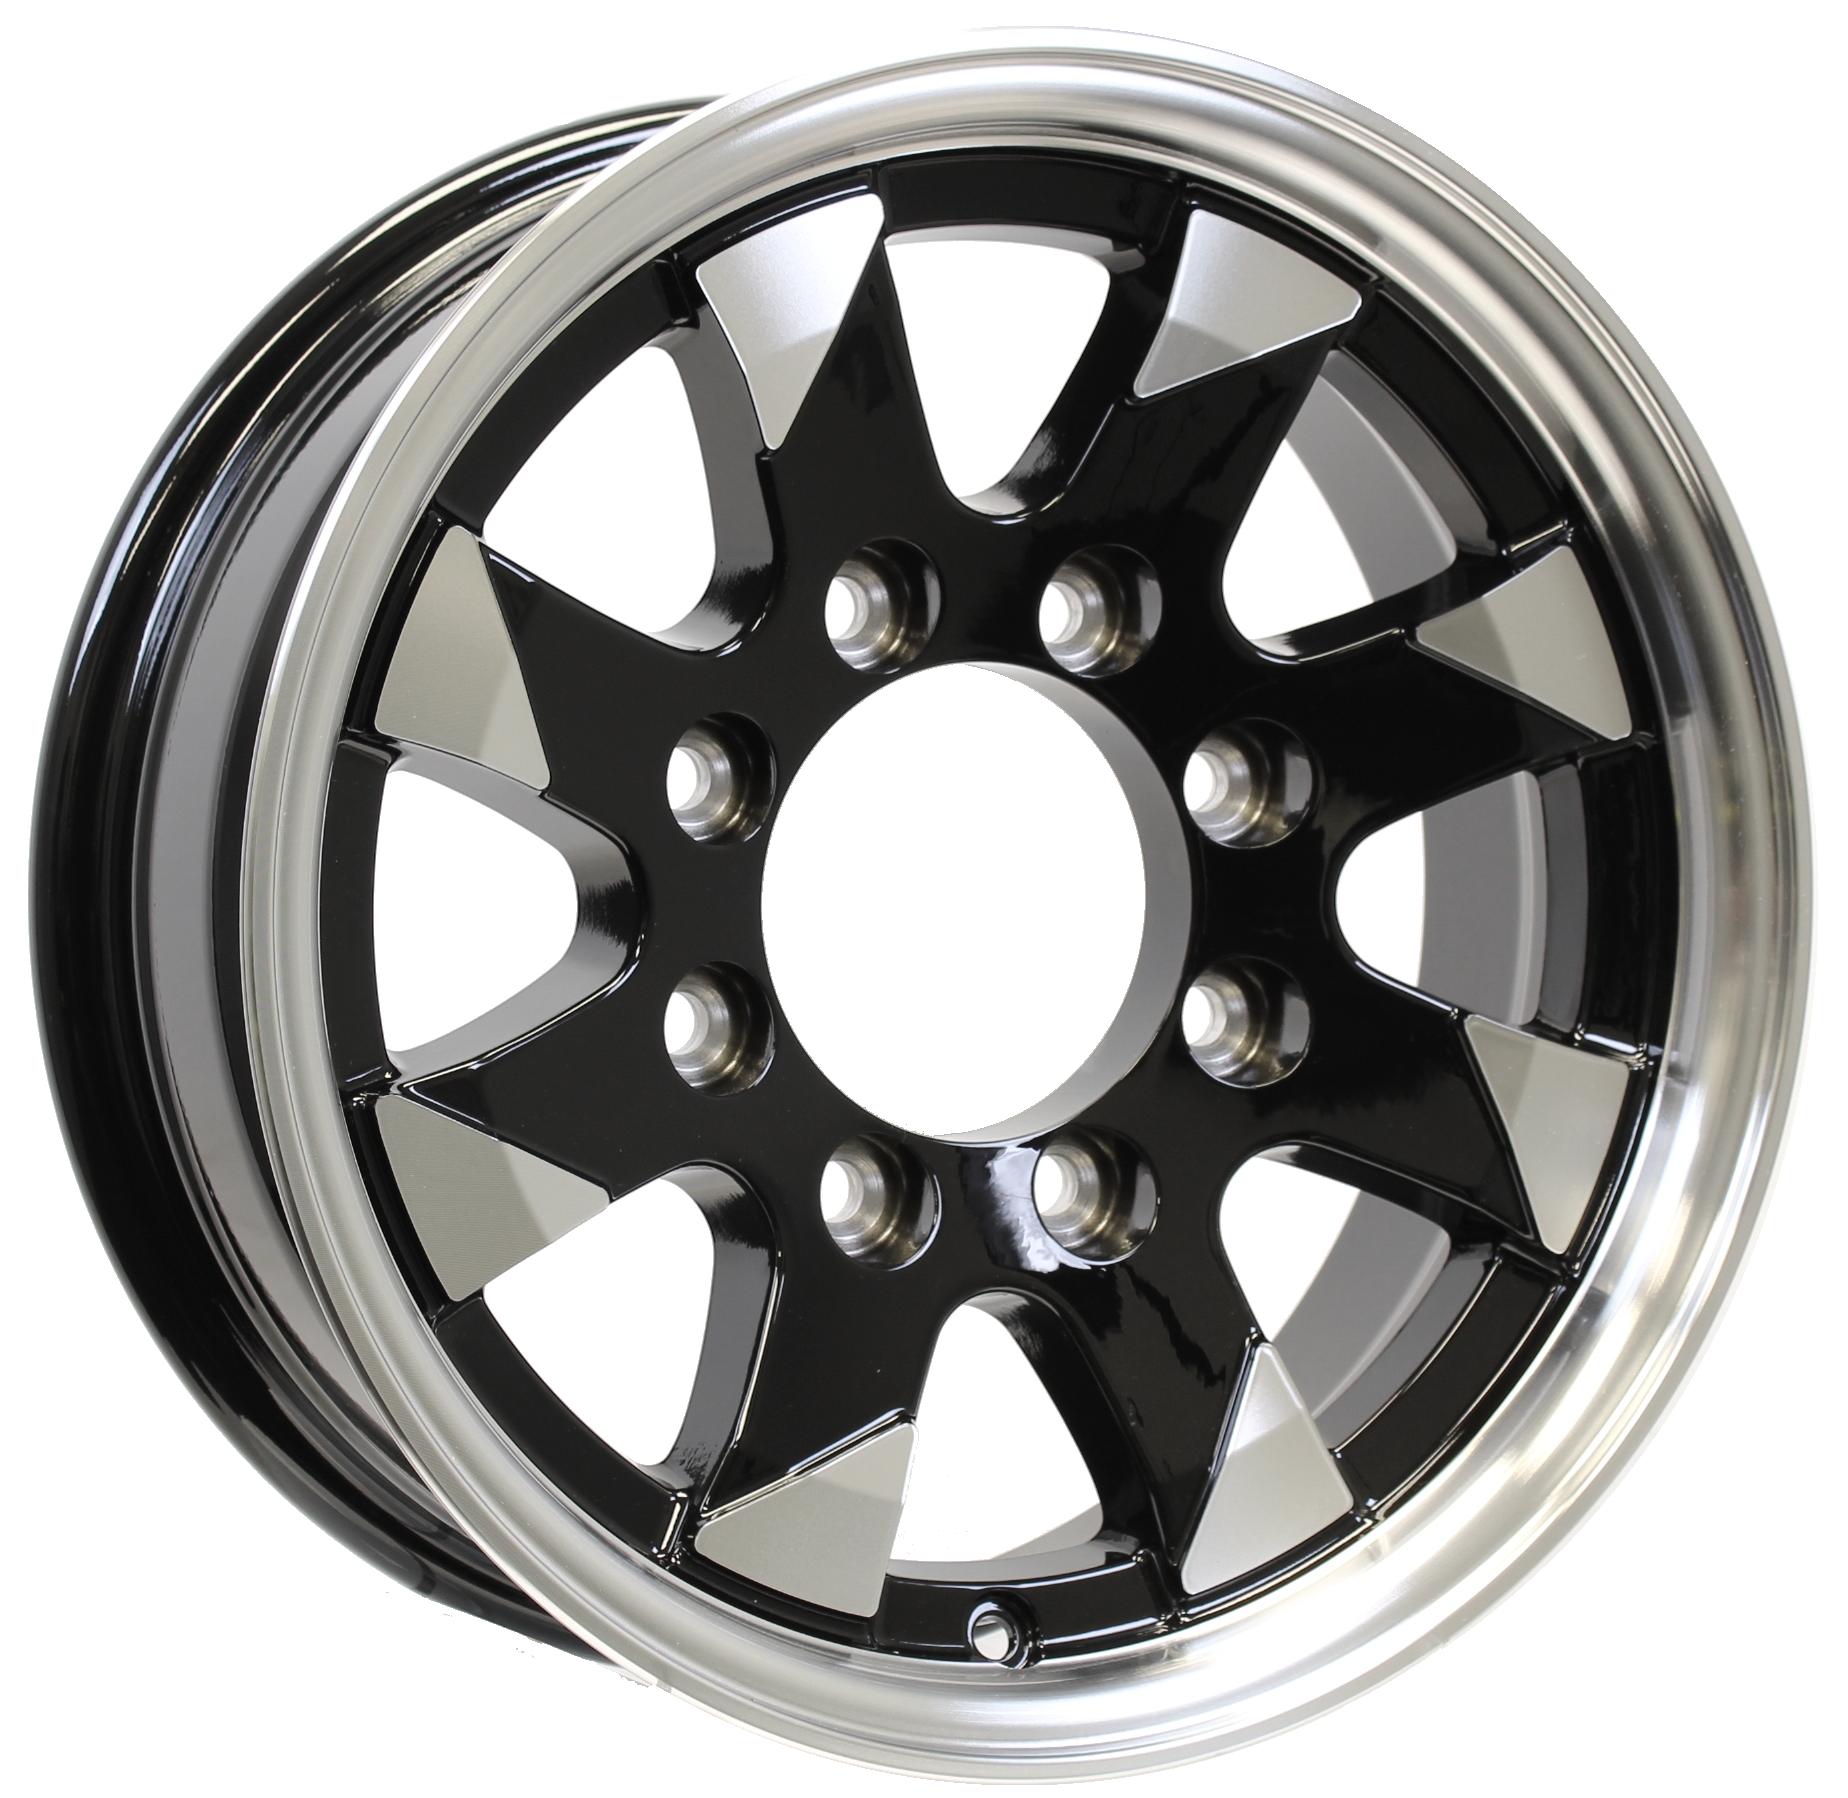 Ascent- 16x6 8-6.5 Black Aluminum Trailer Wheel Image